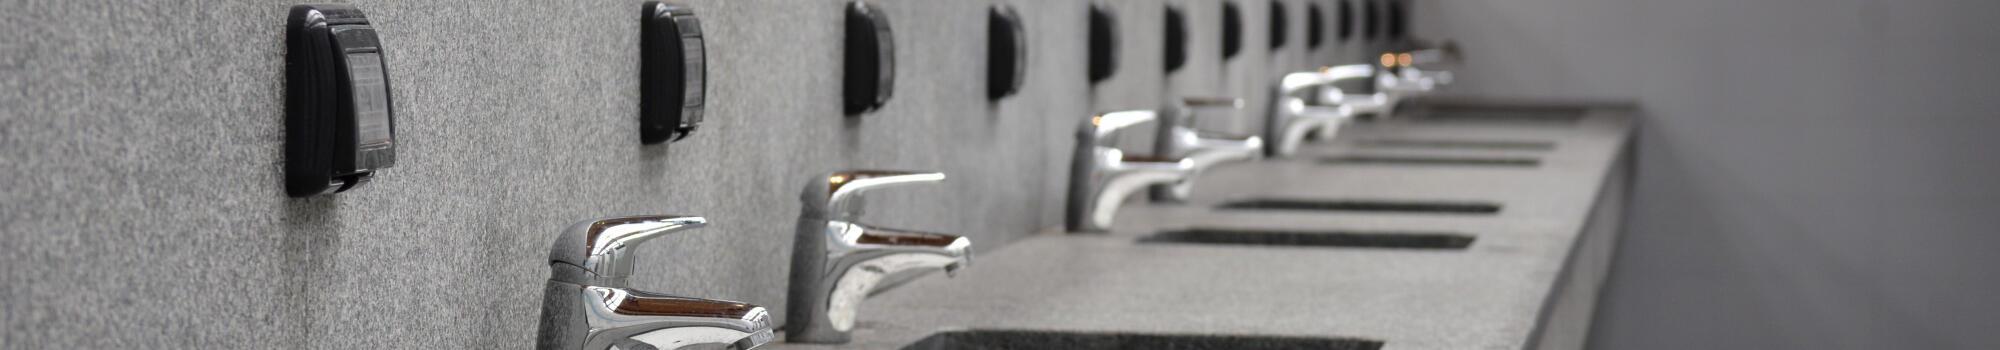 NOVITA' 2021 – Nuovi servizi igienici e bagni privati